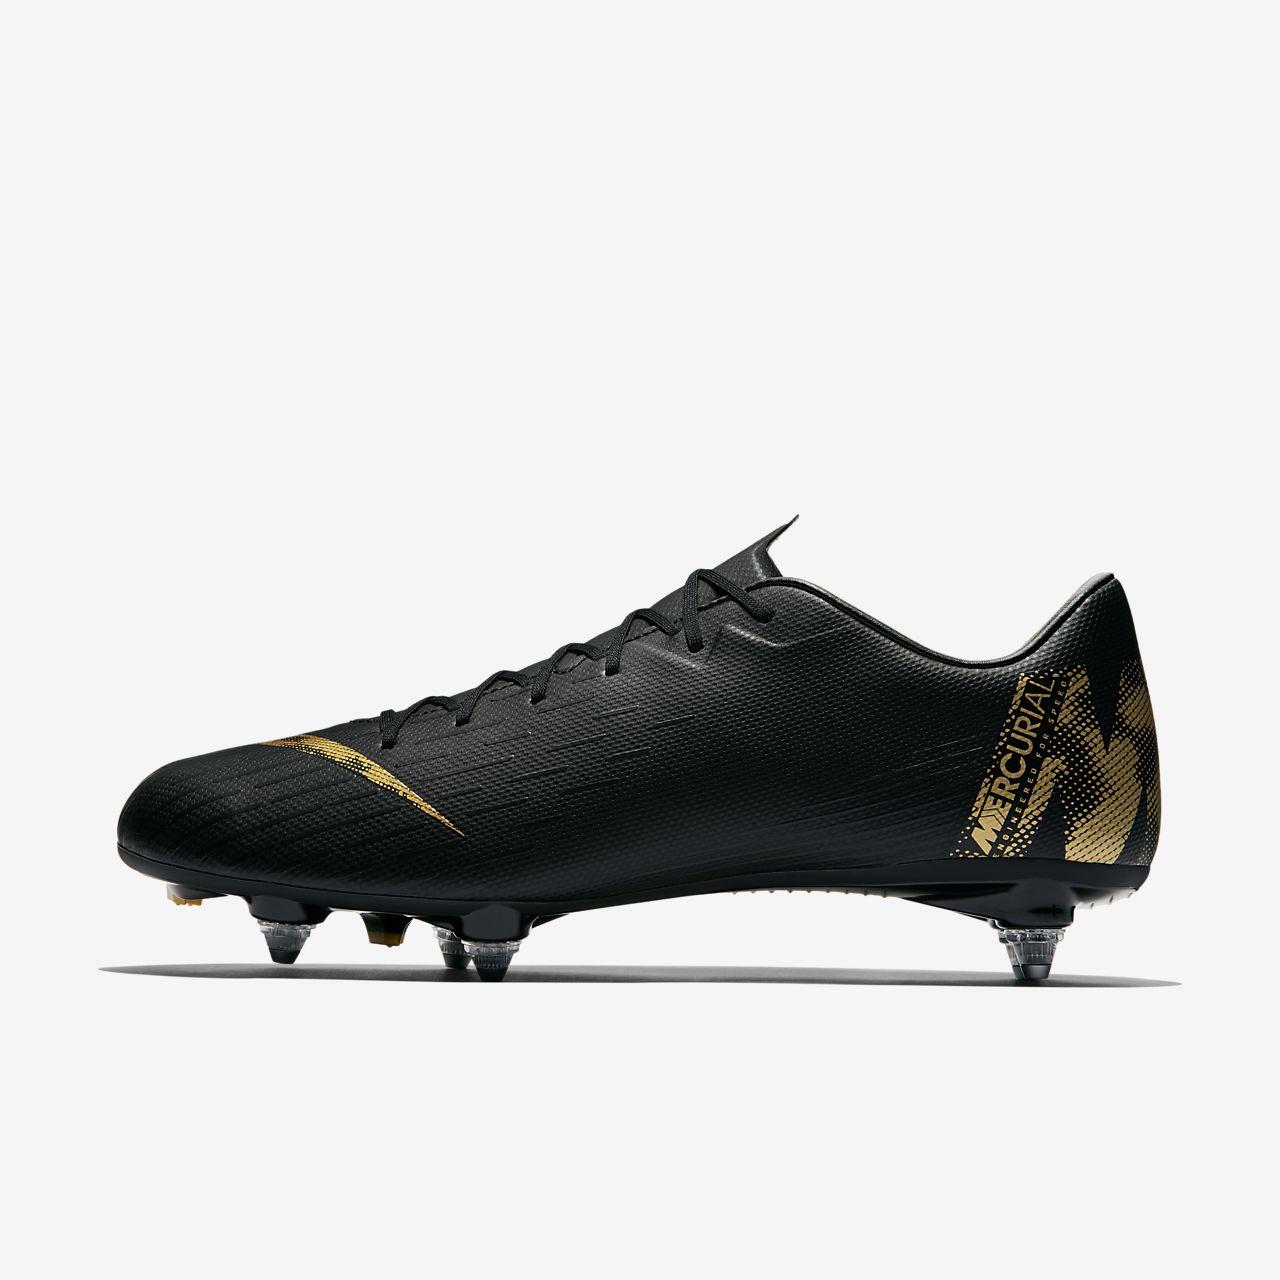 Kopačka na měkký povrch Nike Mercurial Vapor XII Academy SG-PRO